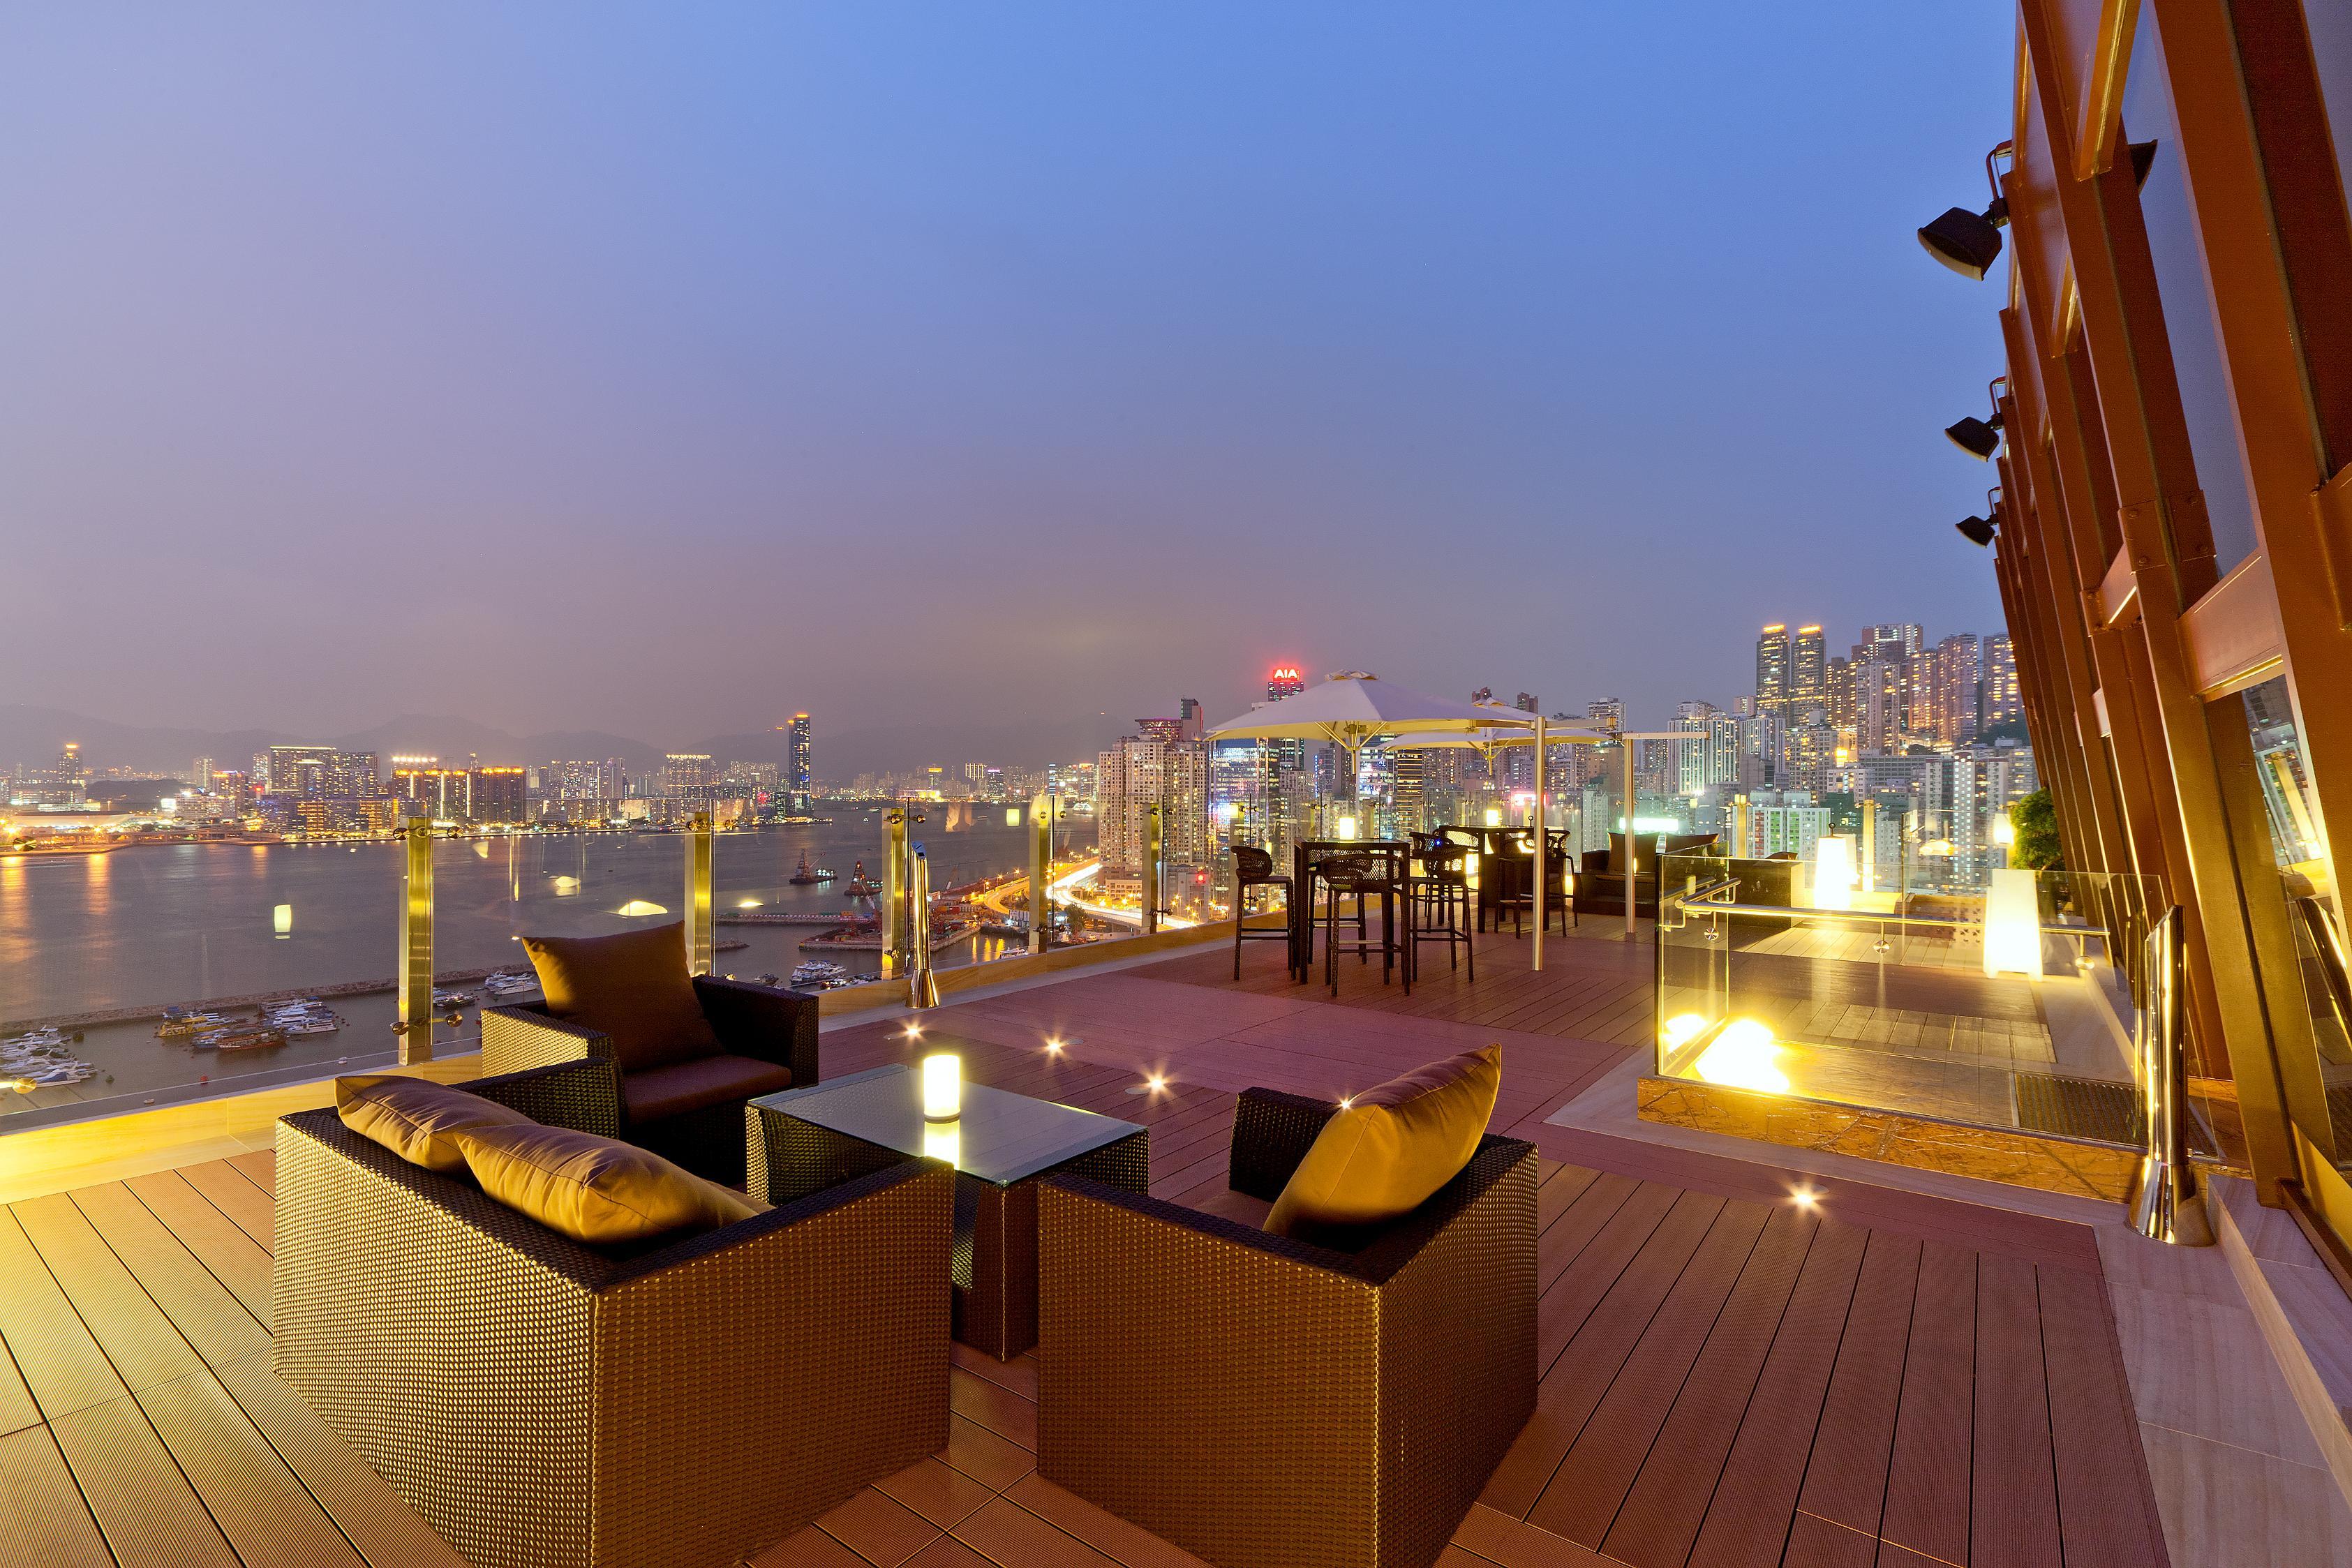 Hong Kong S 14 Best Hotels For Amazing Views Cnn Travel